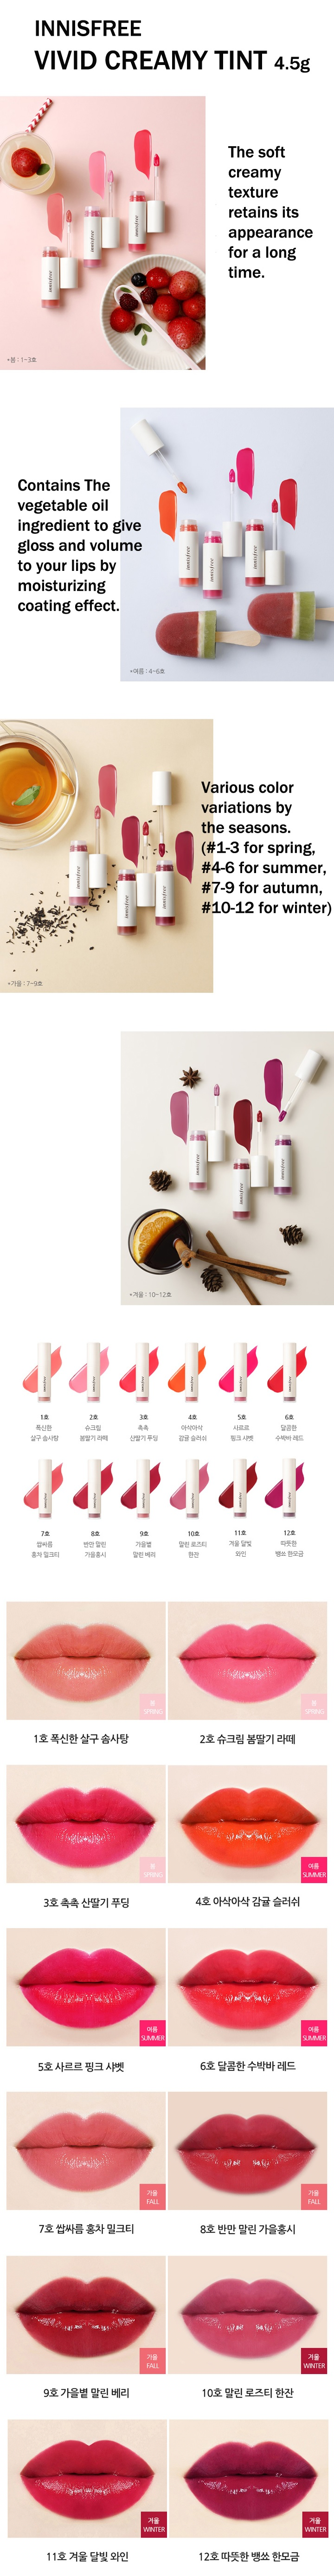 Innisfree Vivid Creamy Tint korean cosmetic makeup product online shop malaysia norway finland1